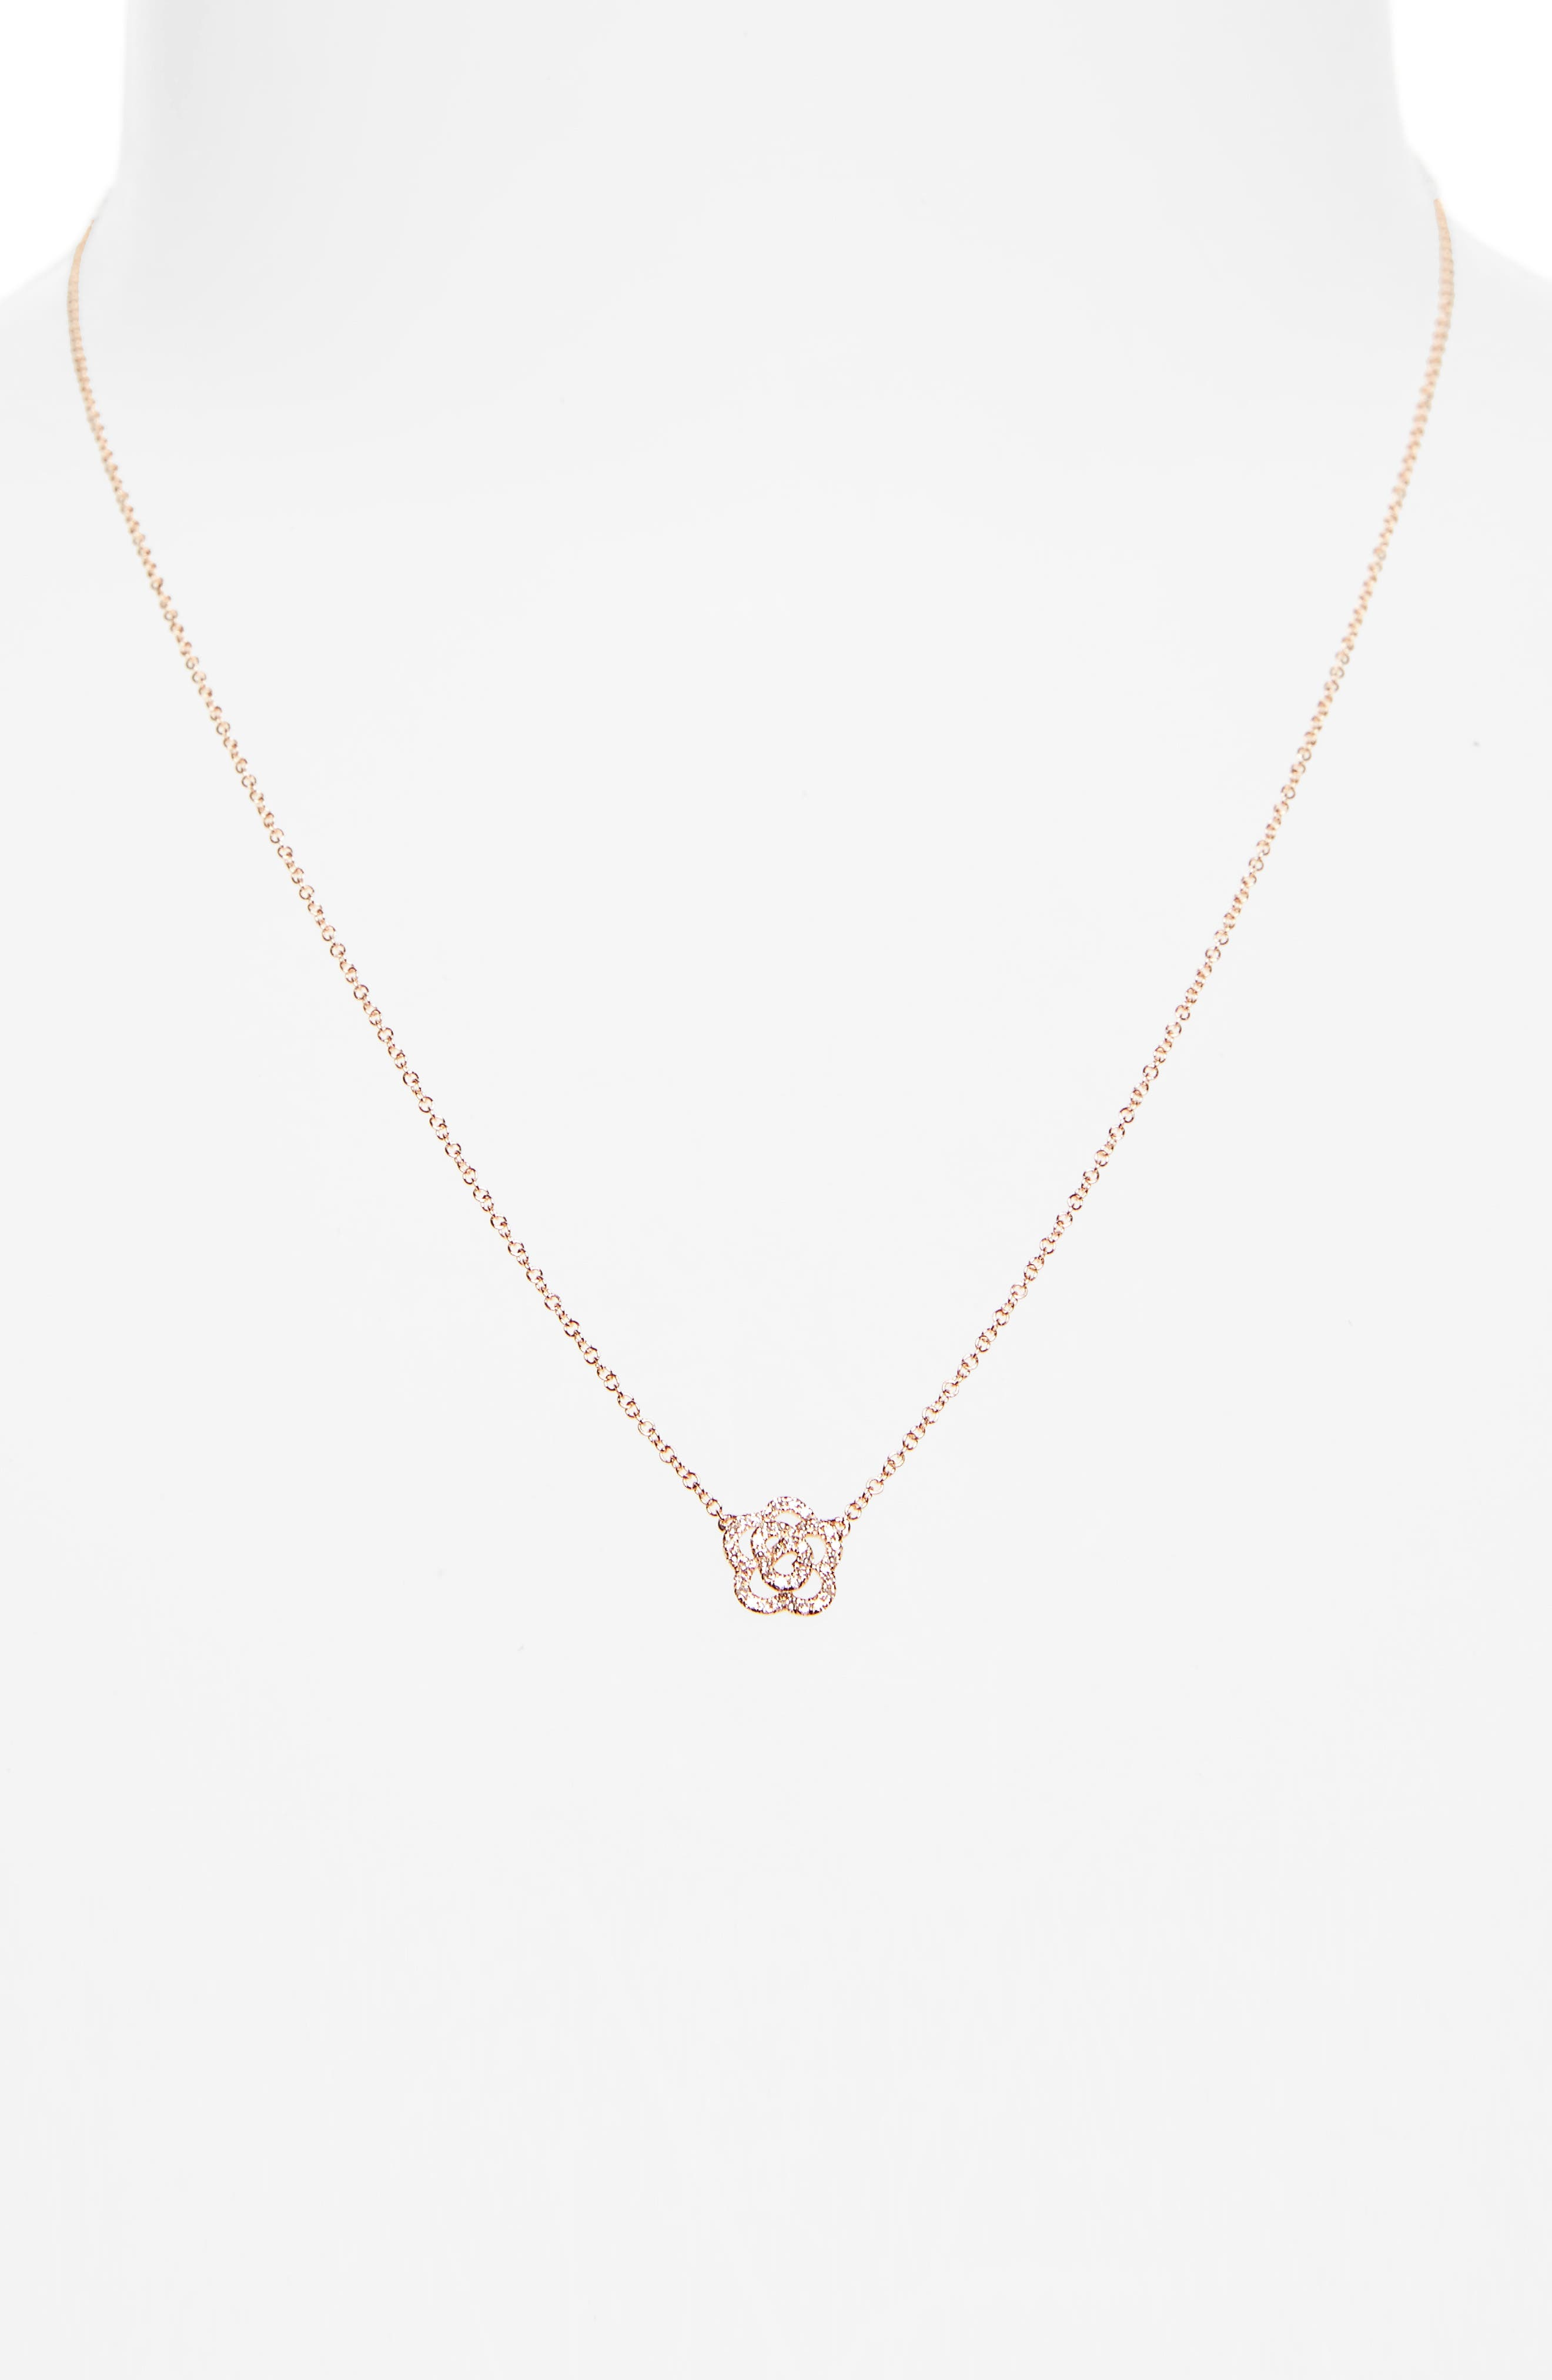 Diamond Pendant Necklace,                             Alternate thumbnail 2, color,                             Rose Gold